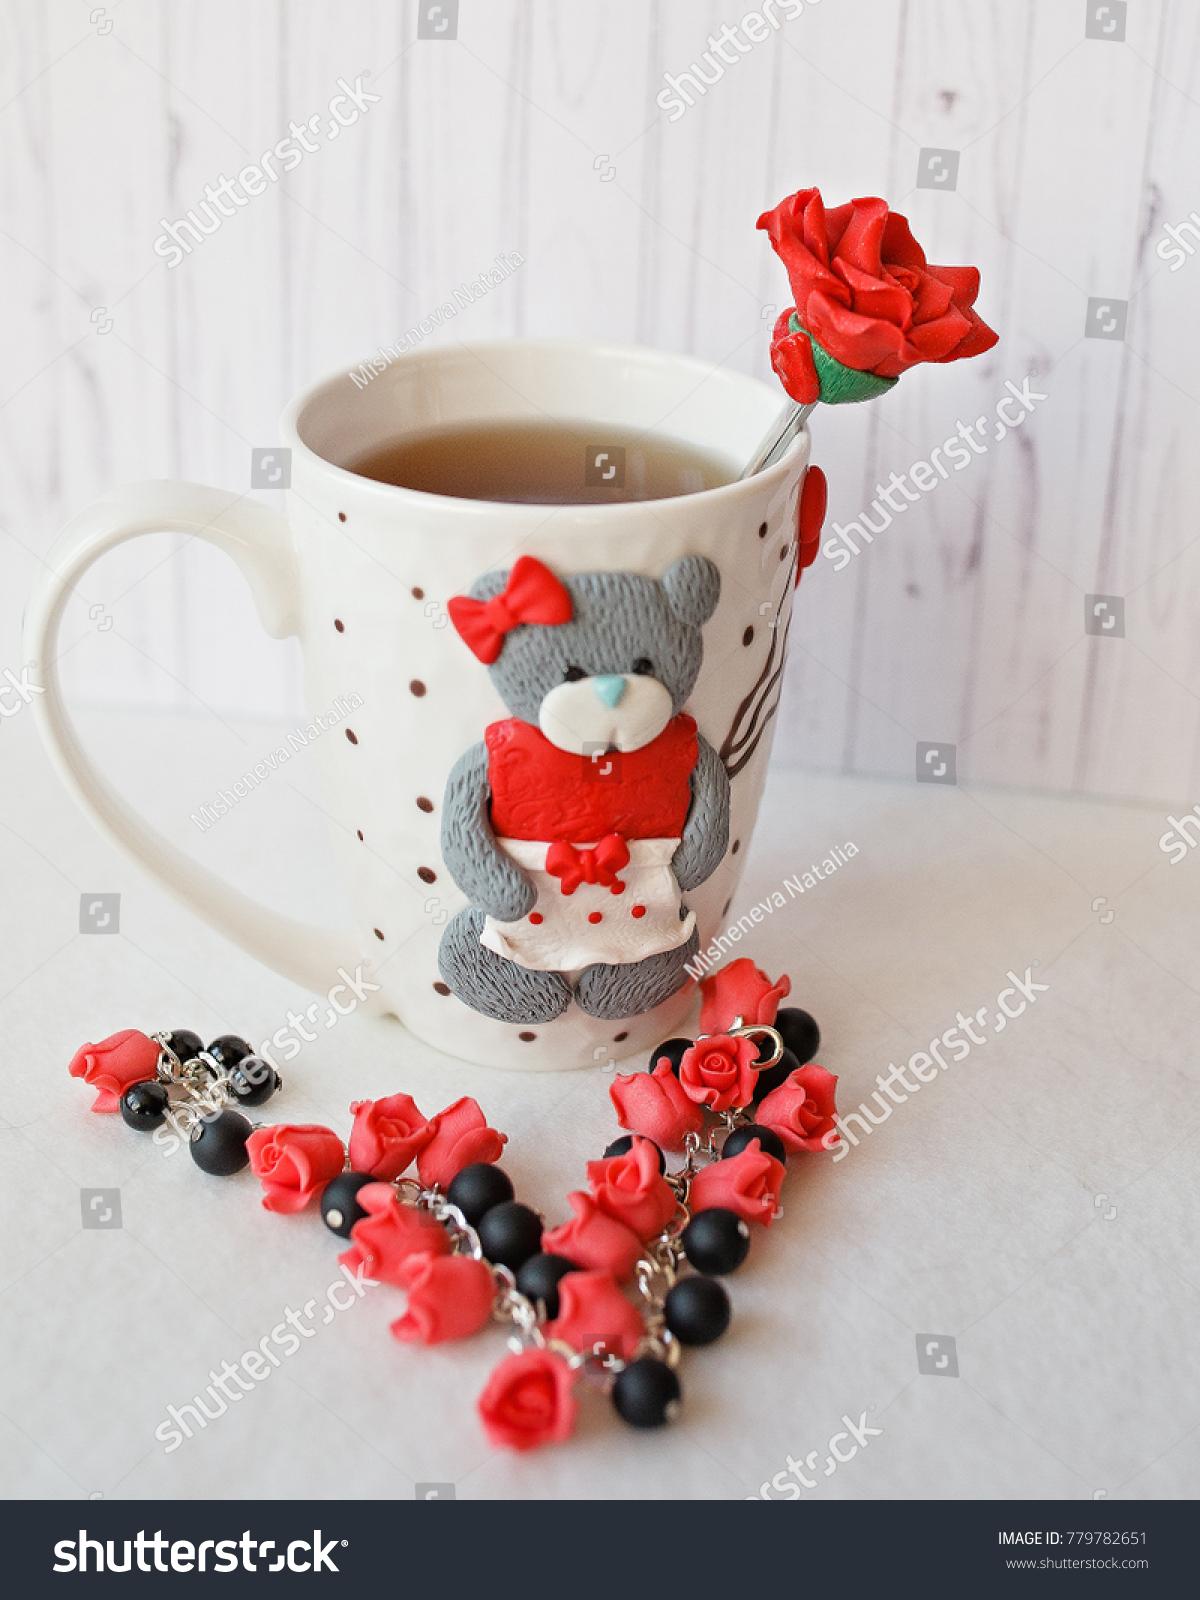 Polymer Clay Decor Happiness Mug Kitchen Stock Photo Edit Now 779782651